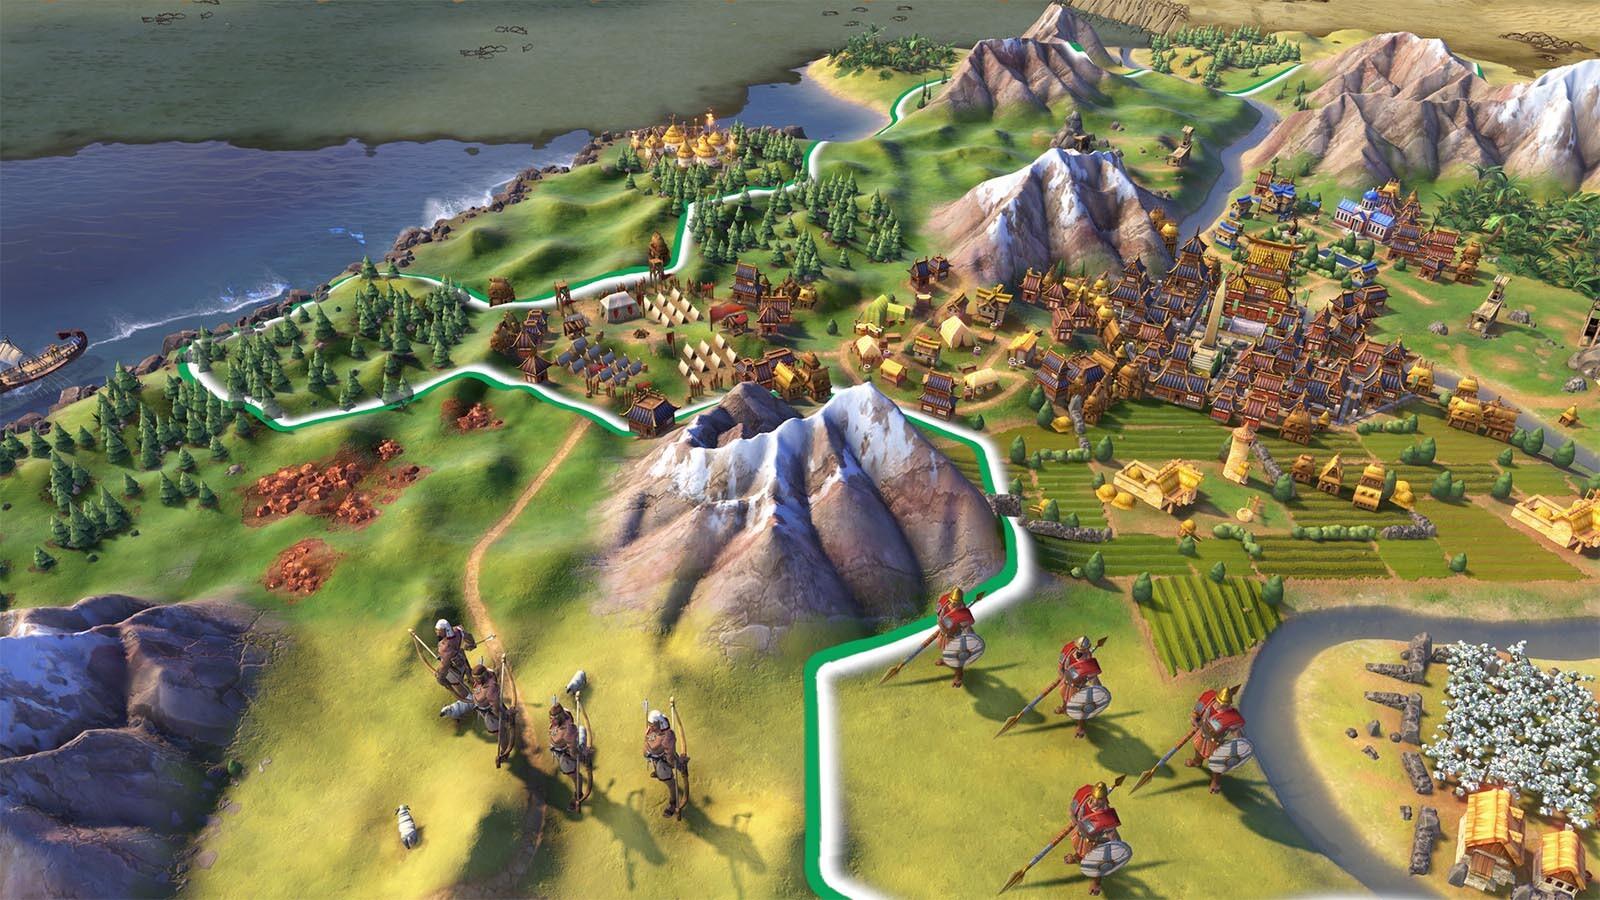 Sid Meier's Civilization VI [Steam CD Key] for PC - Buy now